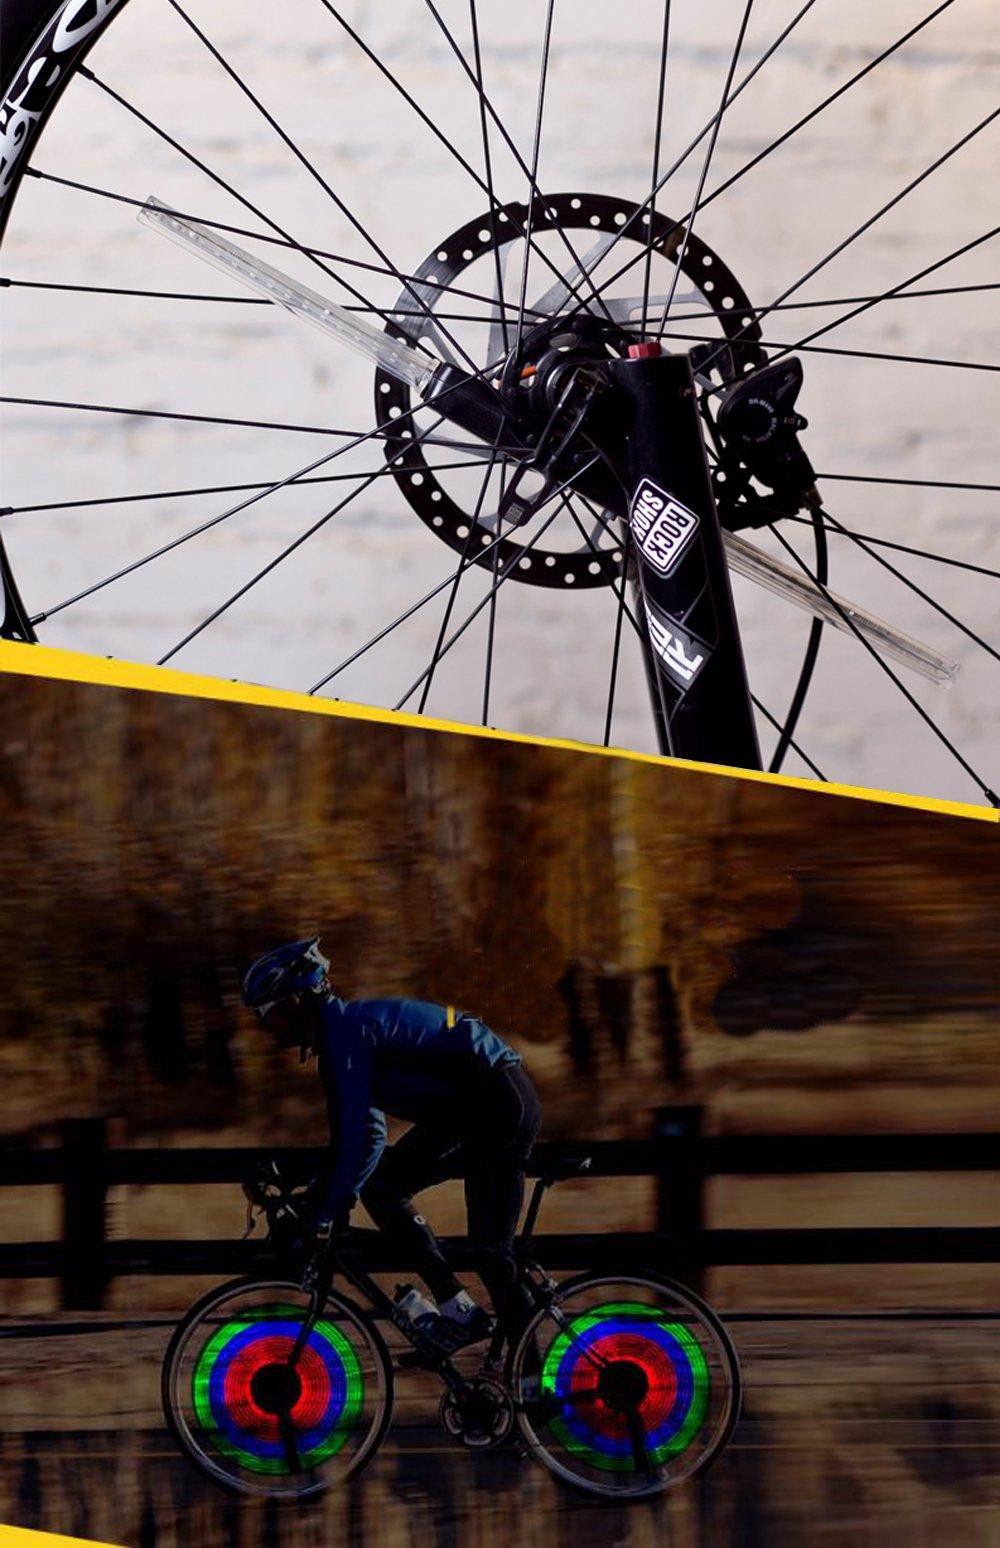 Bicycle//Mountain//Road Bike Wheel Light DIY Program Embedded Processor 64 LEDS